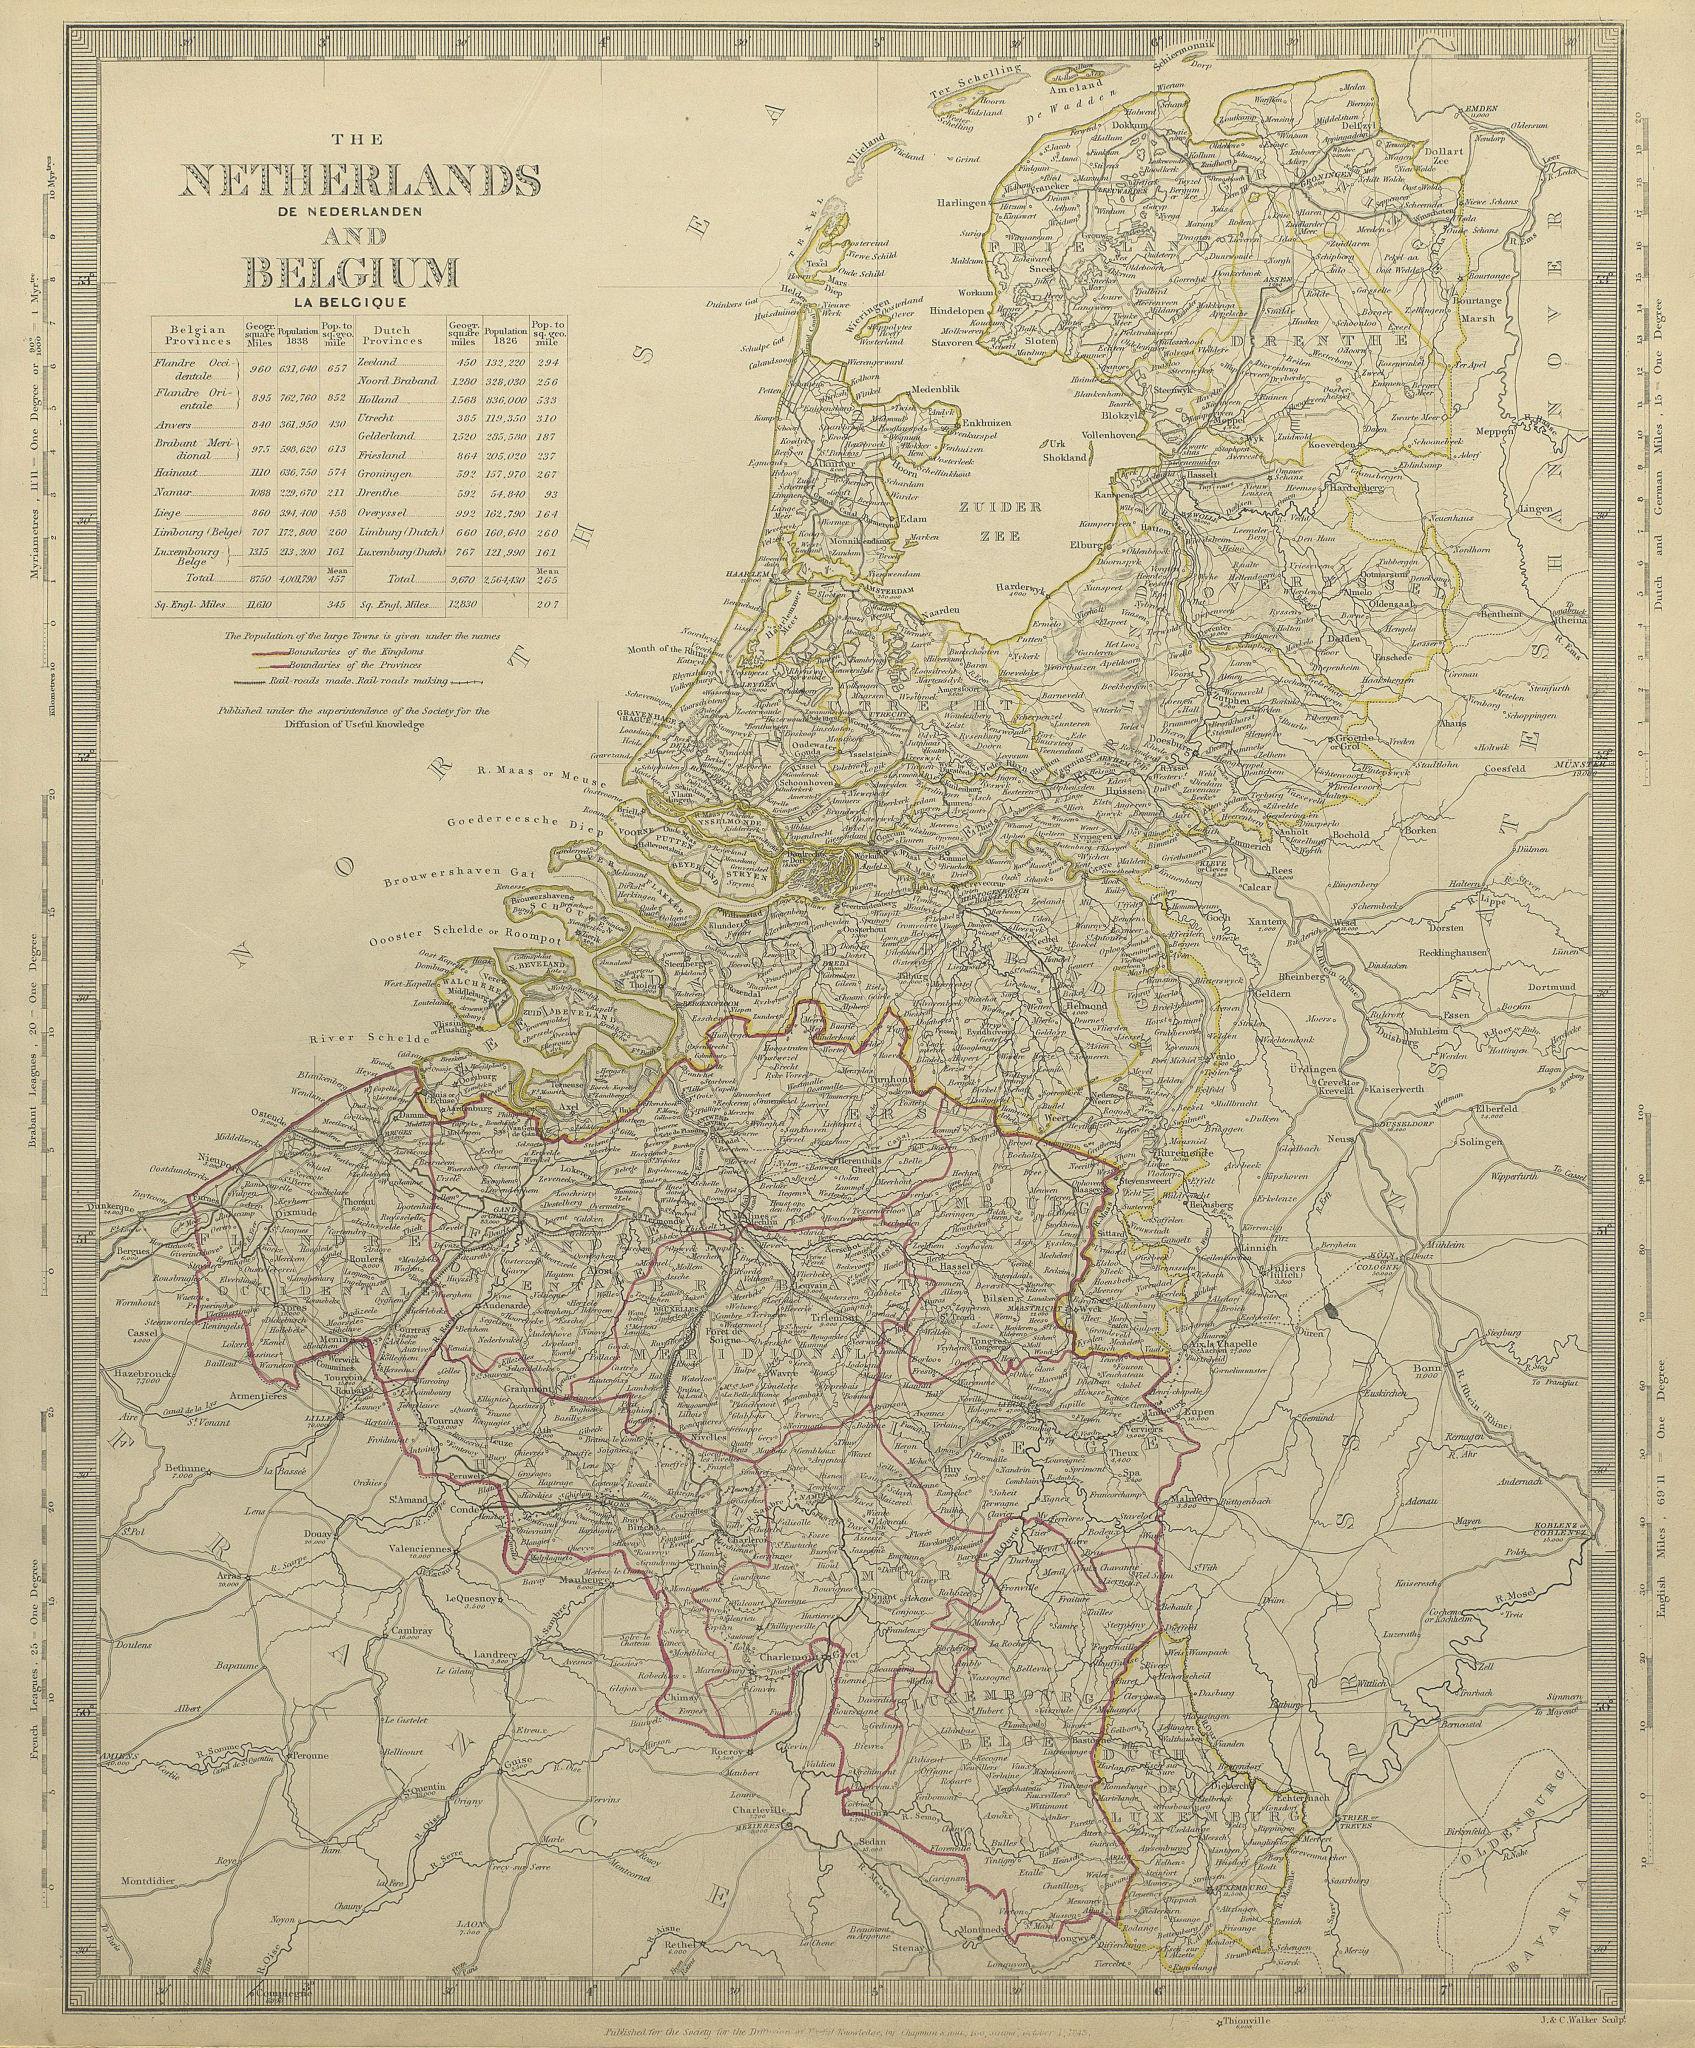 Associate Product NETHERLANDS & BELGIUM w/ railways in use & under construction. SDUK 1844 map